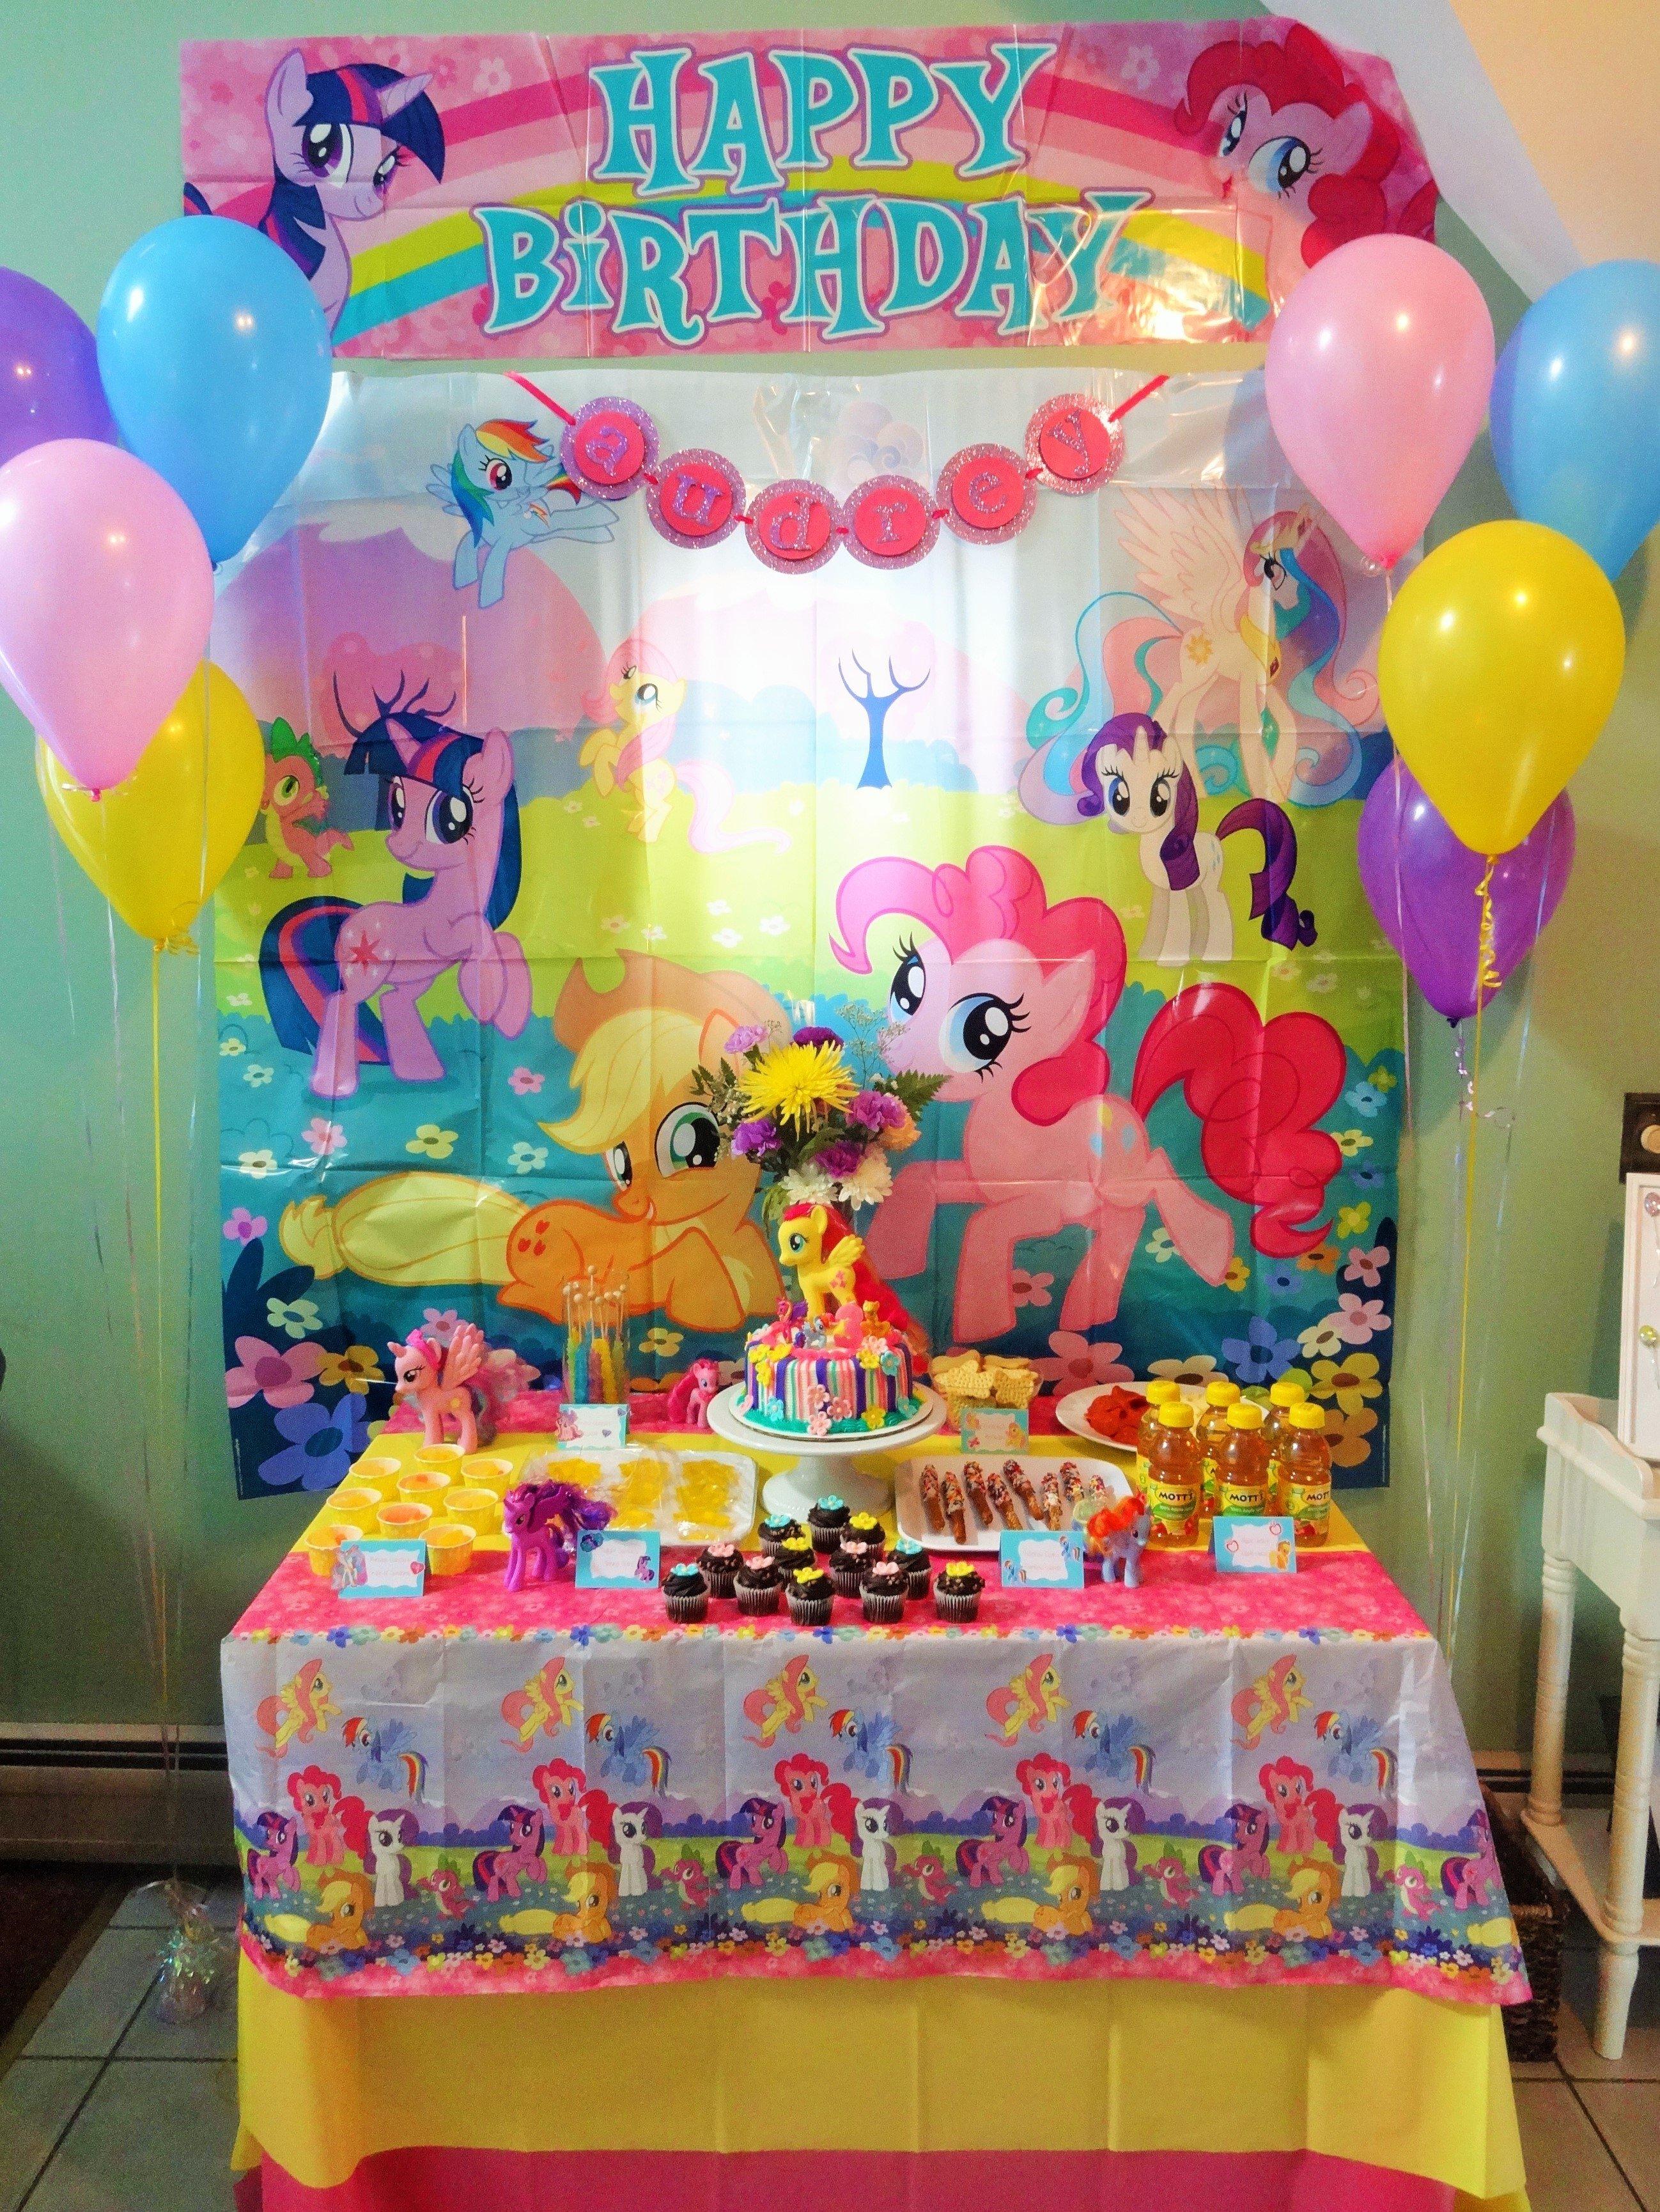 10 Pretty My Little Pony Birthday Party Ideas mlp birthday card new 8 my little pony centerpiece printable my 2021